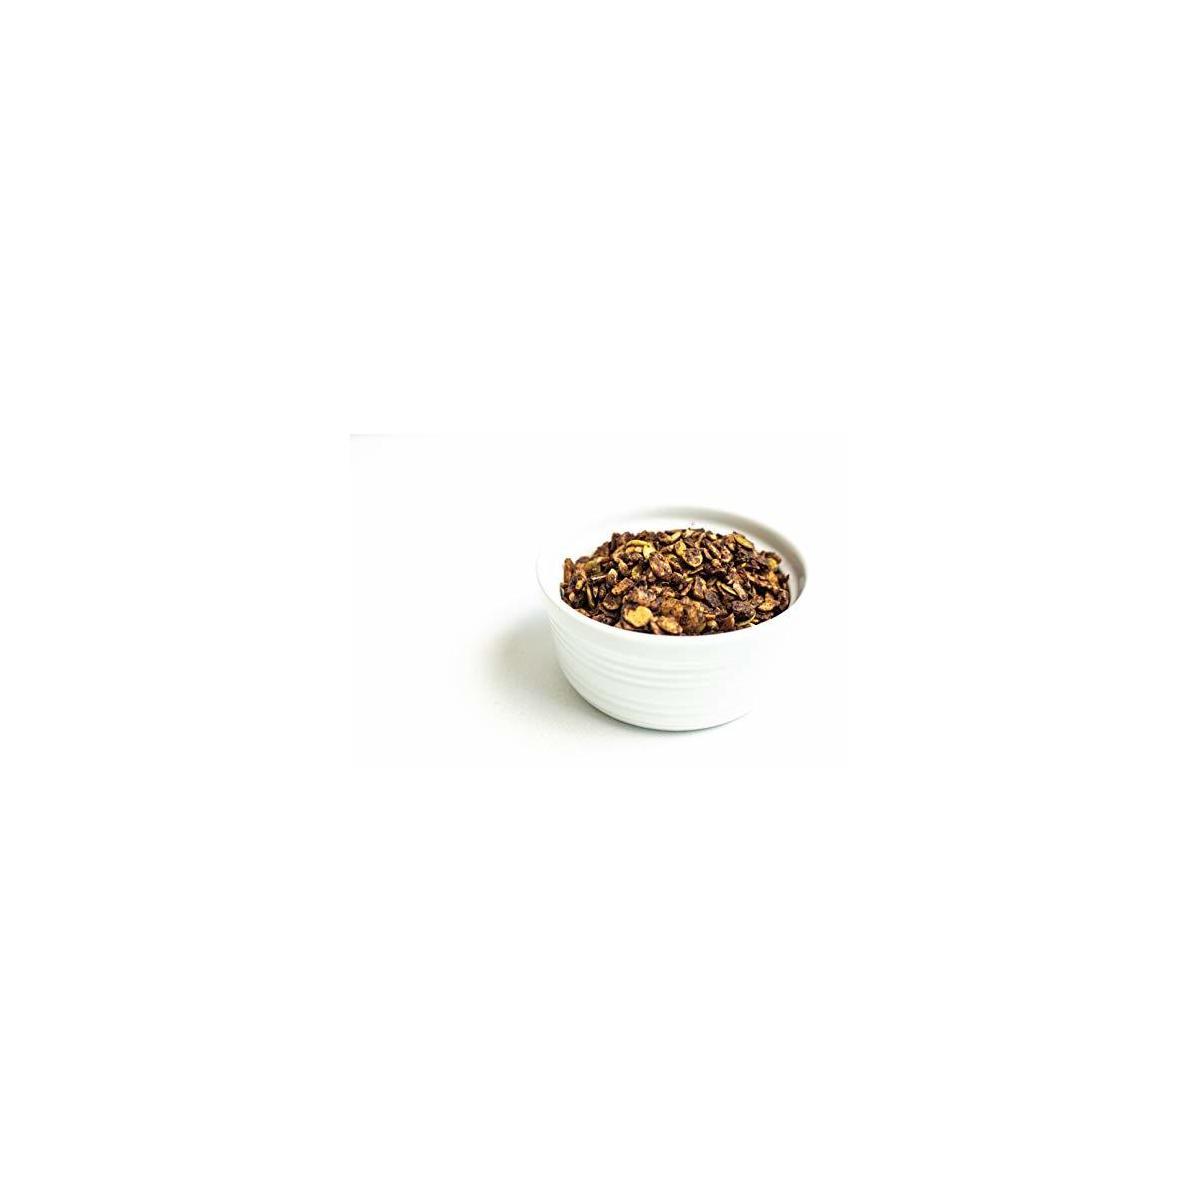 Livlo Keto Granola Cereal - 1g Net Carbs - Grain Free & Gluten Free Granola - Low Carb Keto Snacks & Food - Ketogenic, Paleo & Diabetic Friendly, Chocolate Hazelnut, 11oz